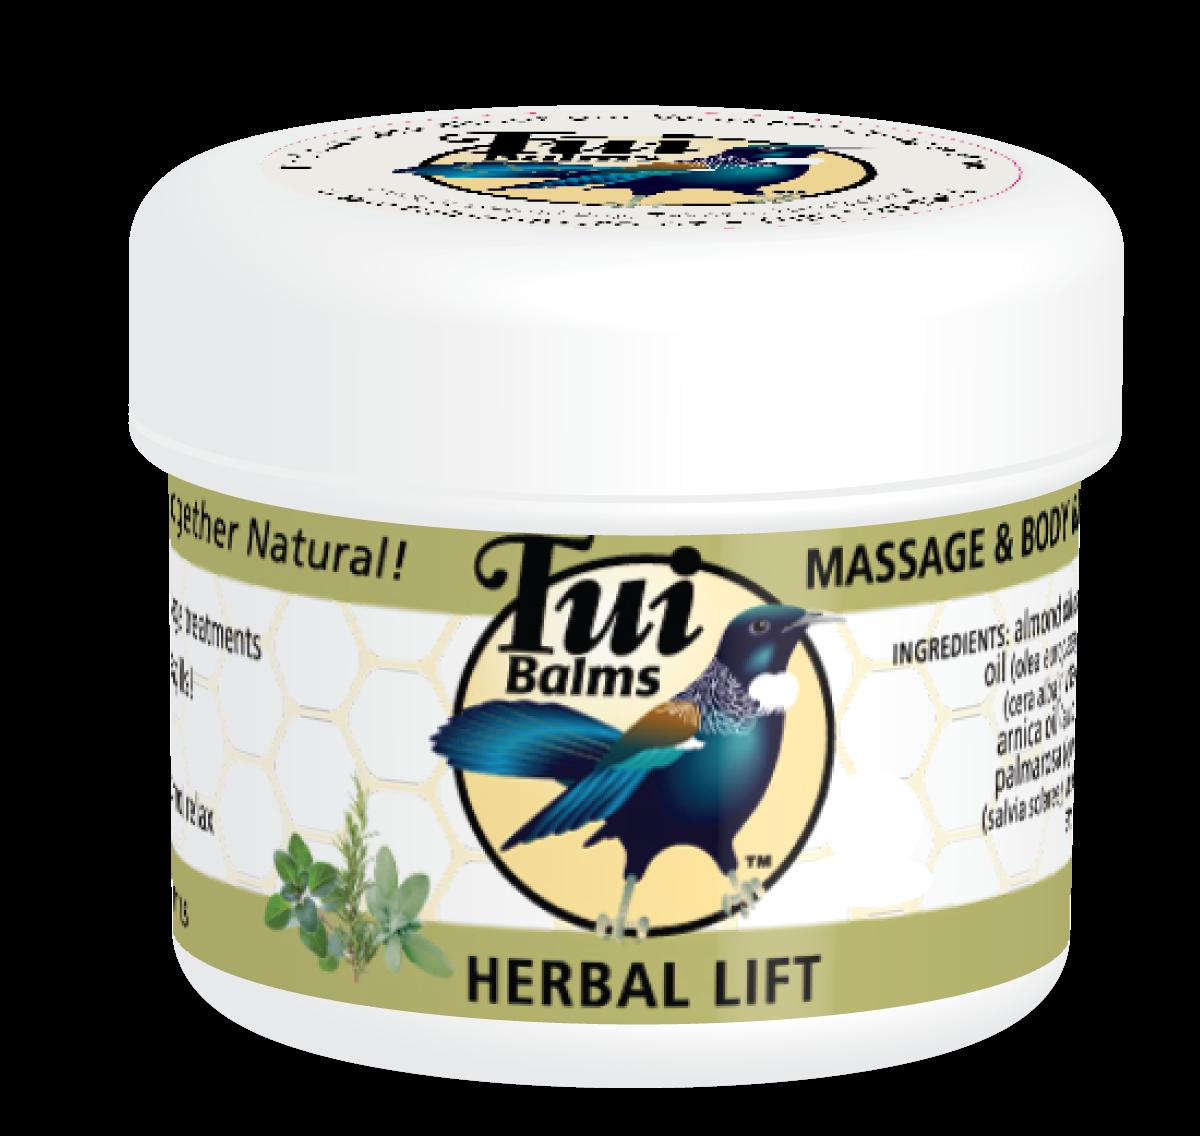 Massage & Body Balm HERBAL LIFT